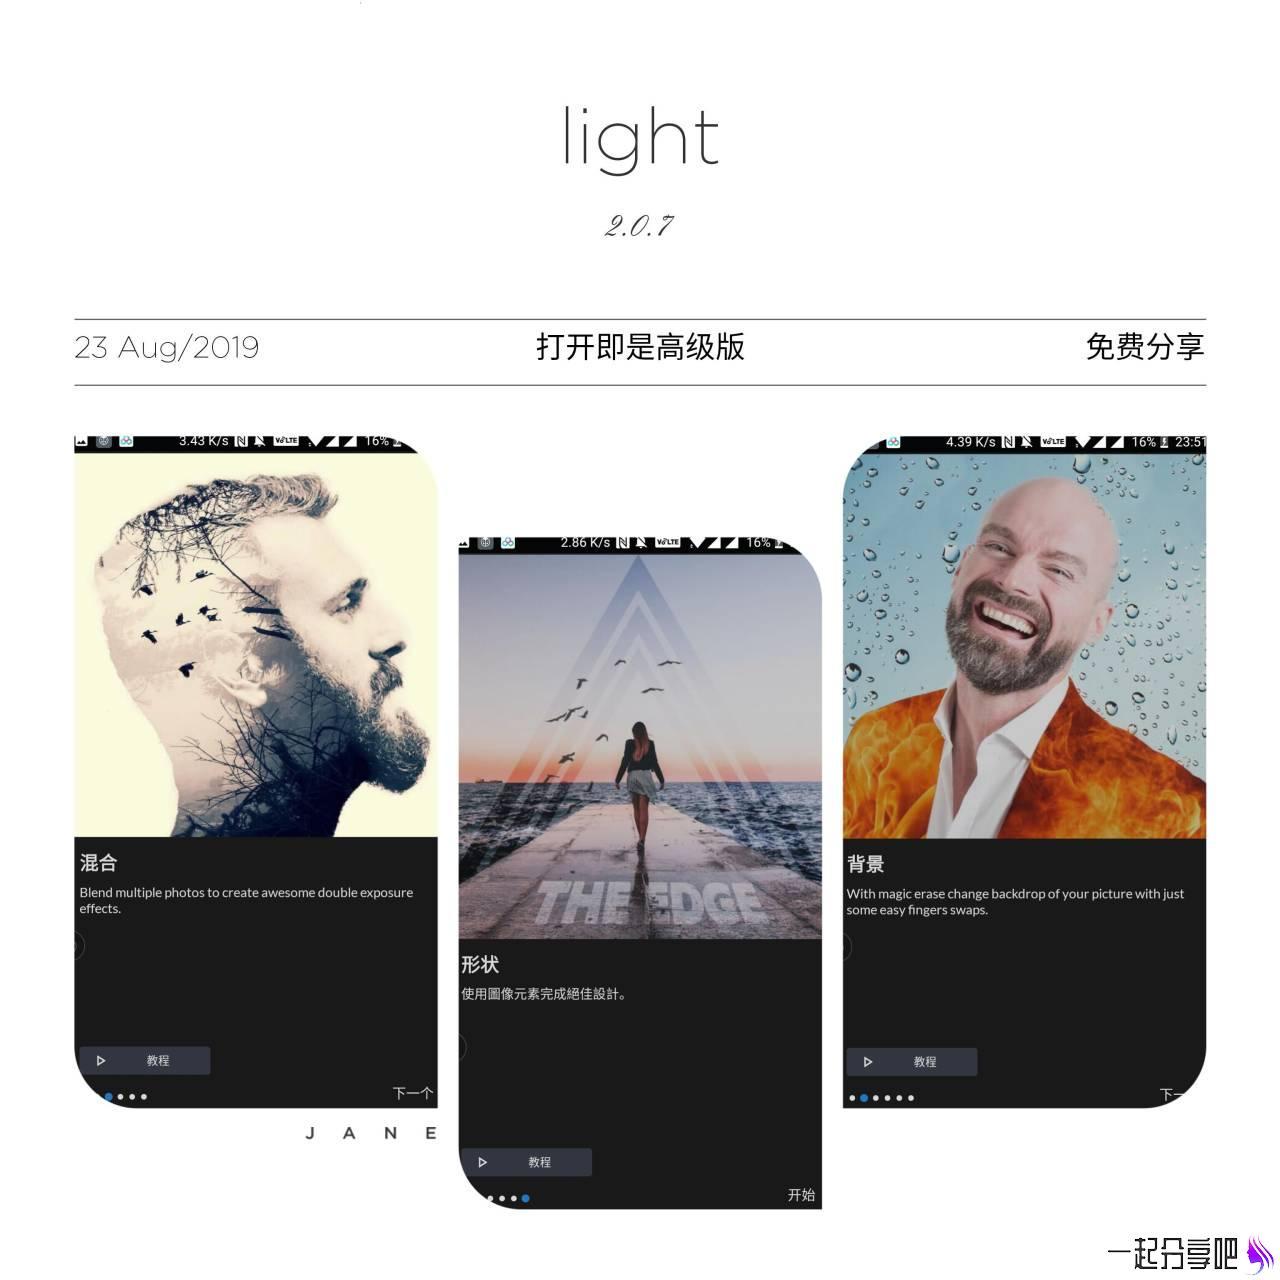 LightX专业版 非常好用的照片编辑神器 第1张